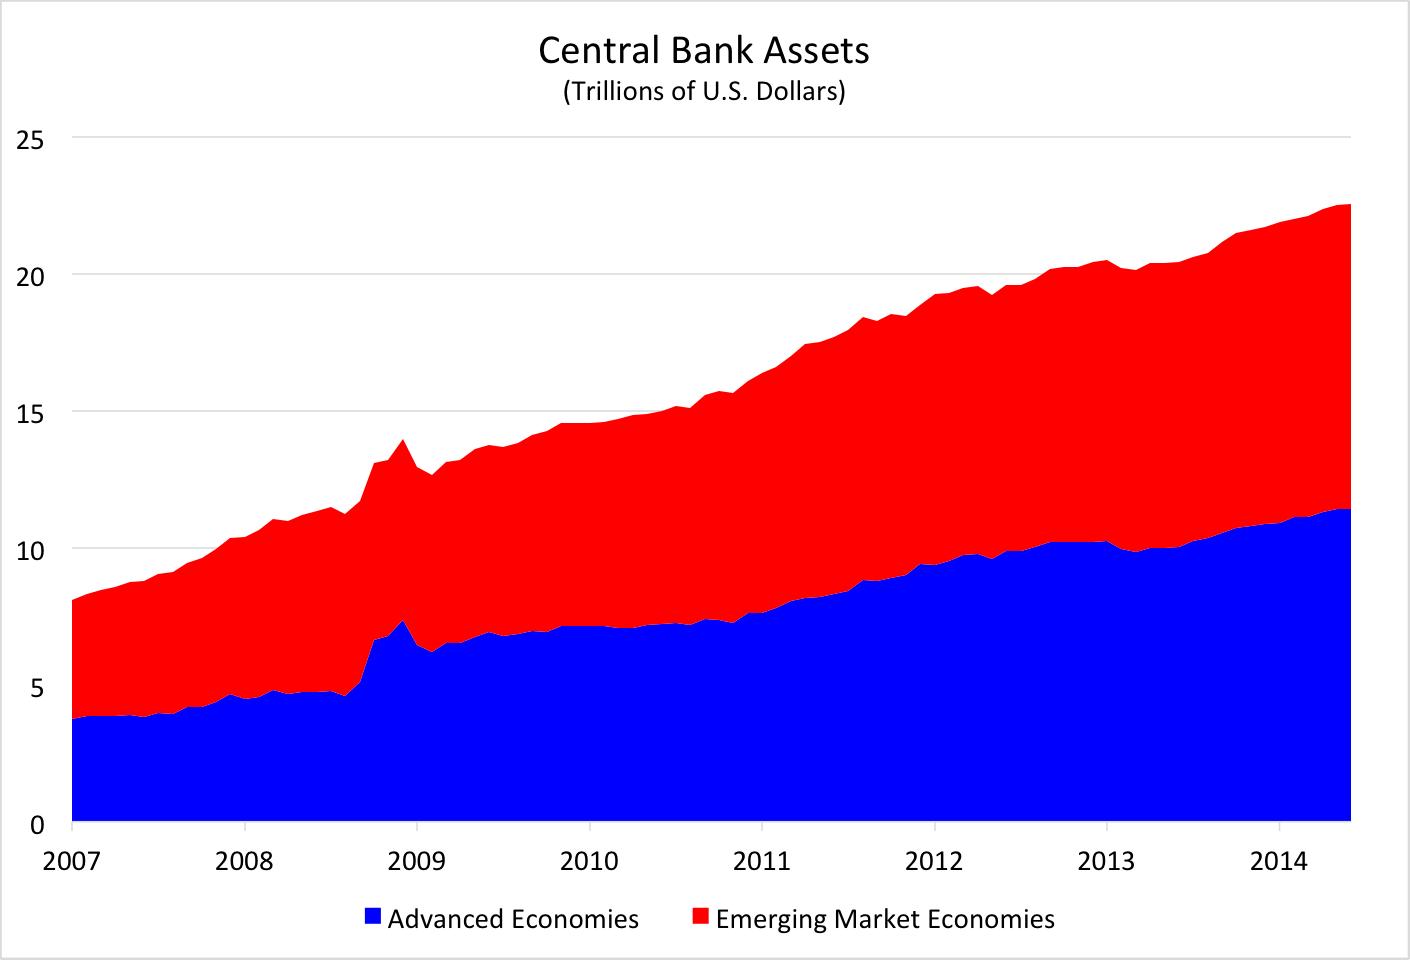 Source: National central banks.